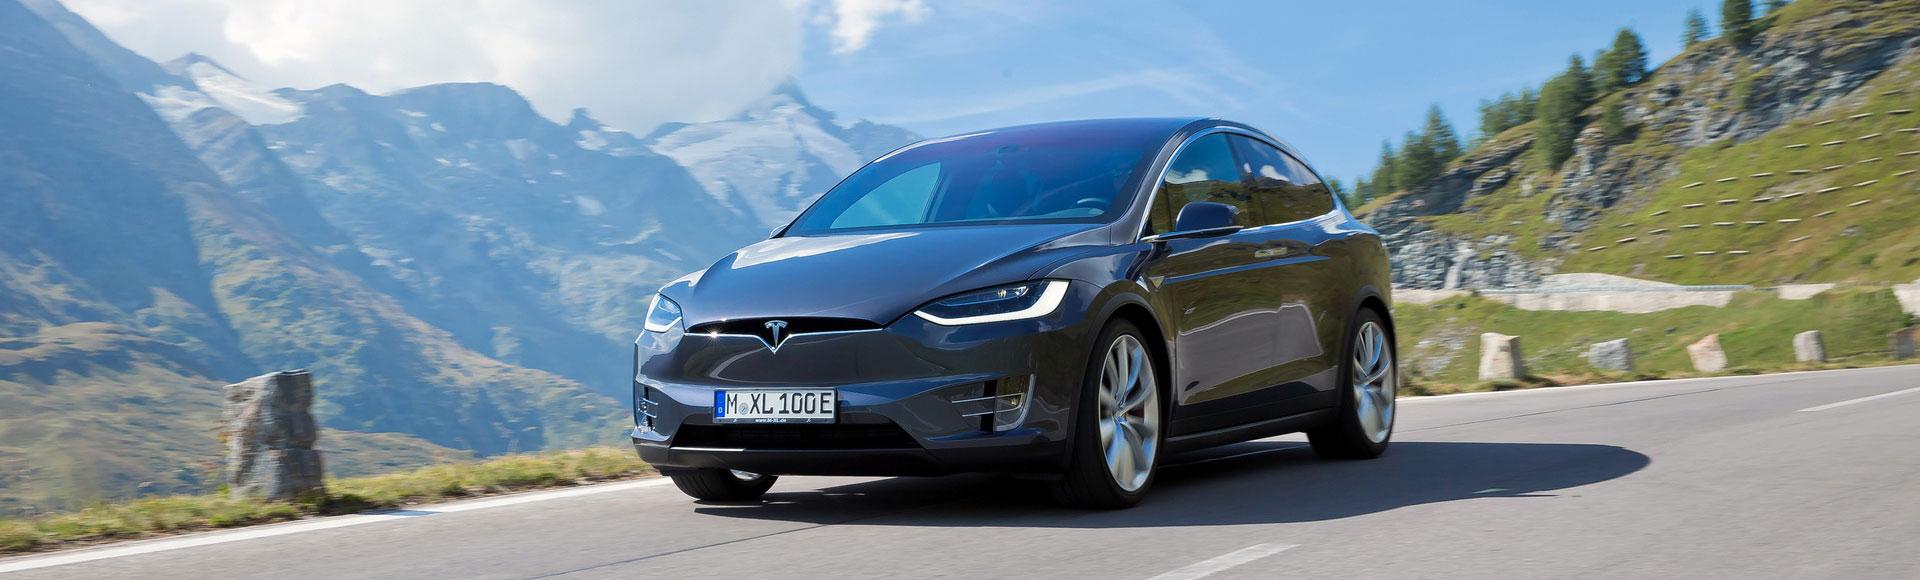 Tesla Model X 2016 082 Sommer